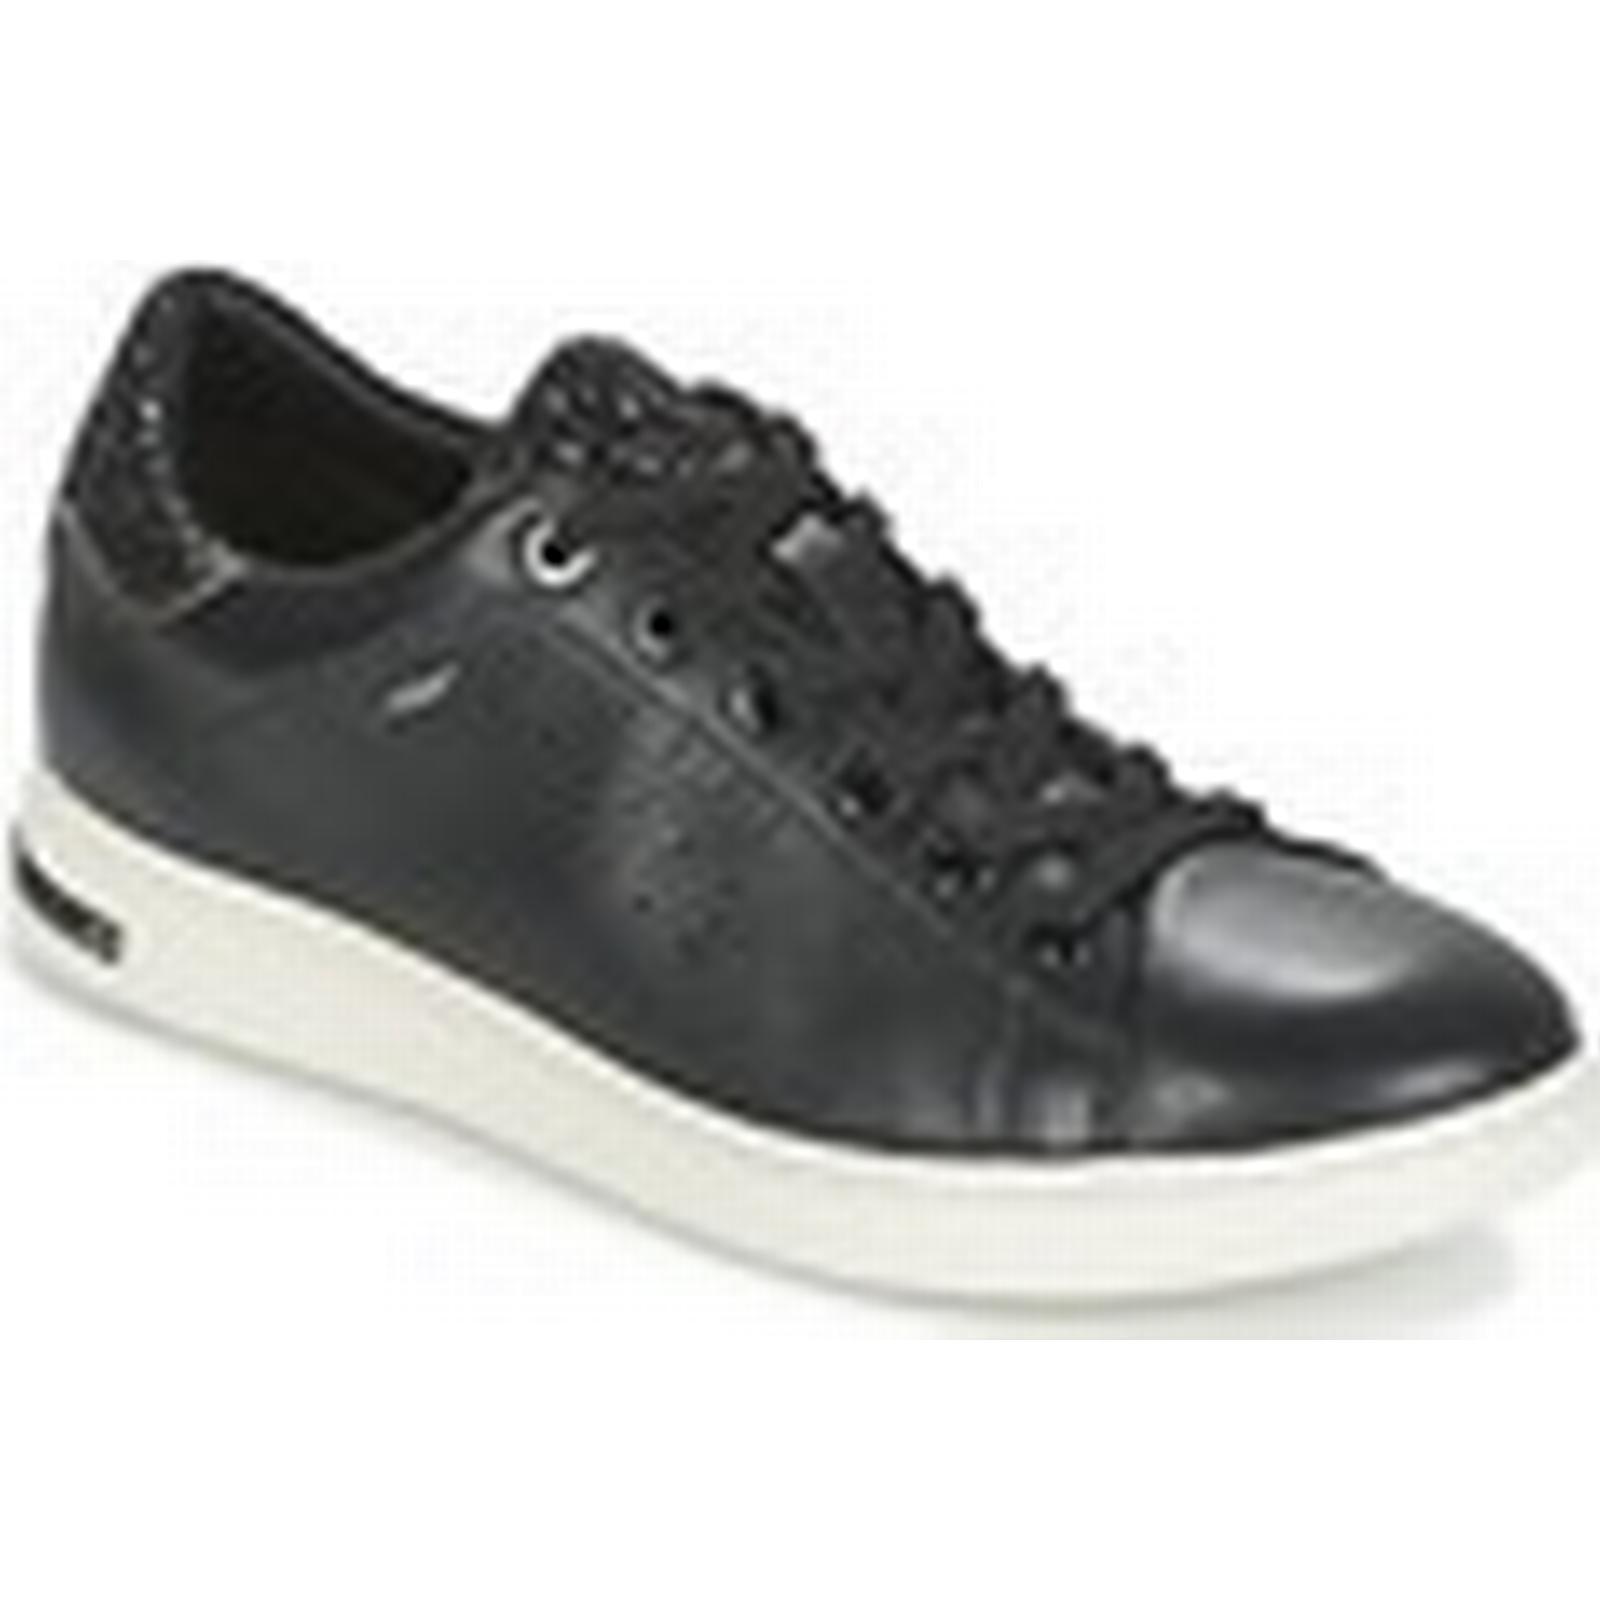 Geox   Geox JAYSEN  women's Shoes (Trainers) in Black 3bbecd